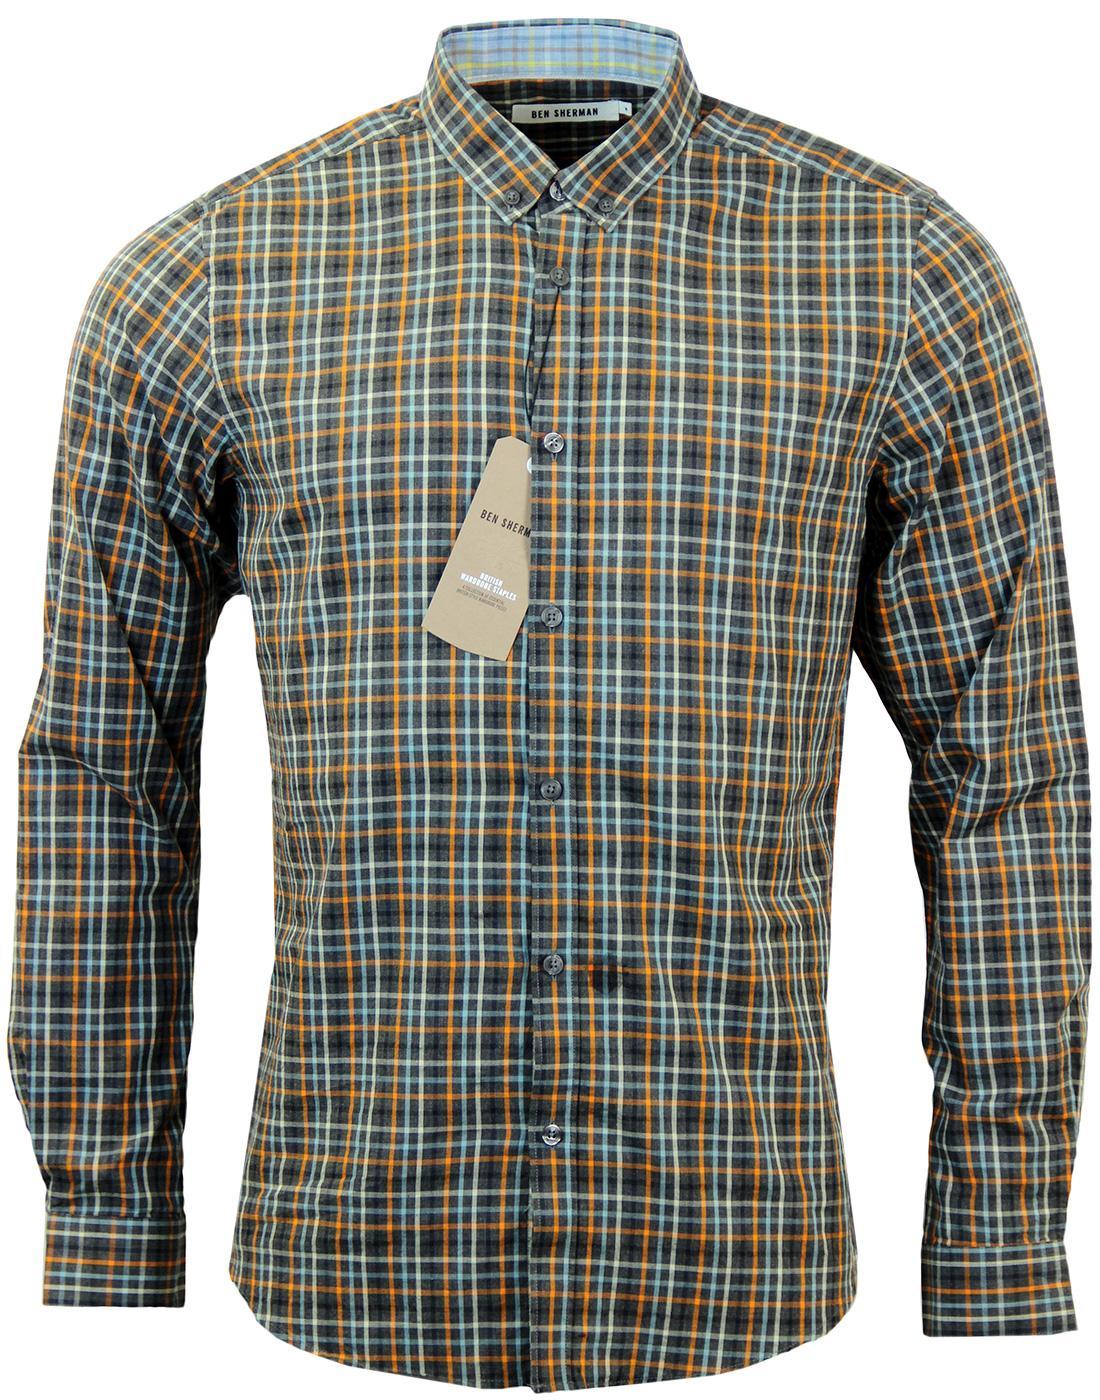 BEN SHERMAN Slub Multi Check Retro Mod Shirt